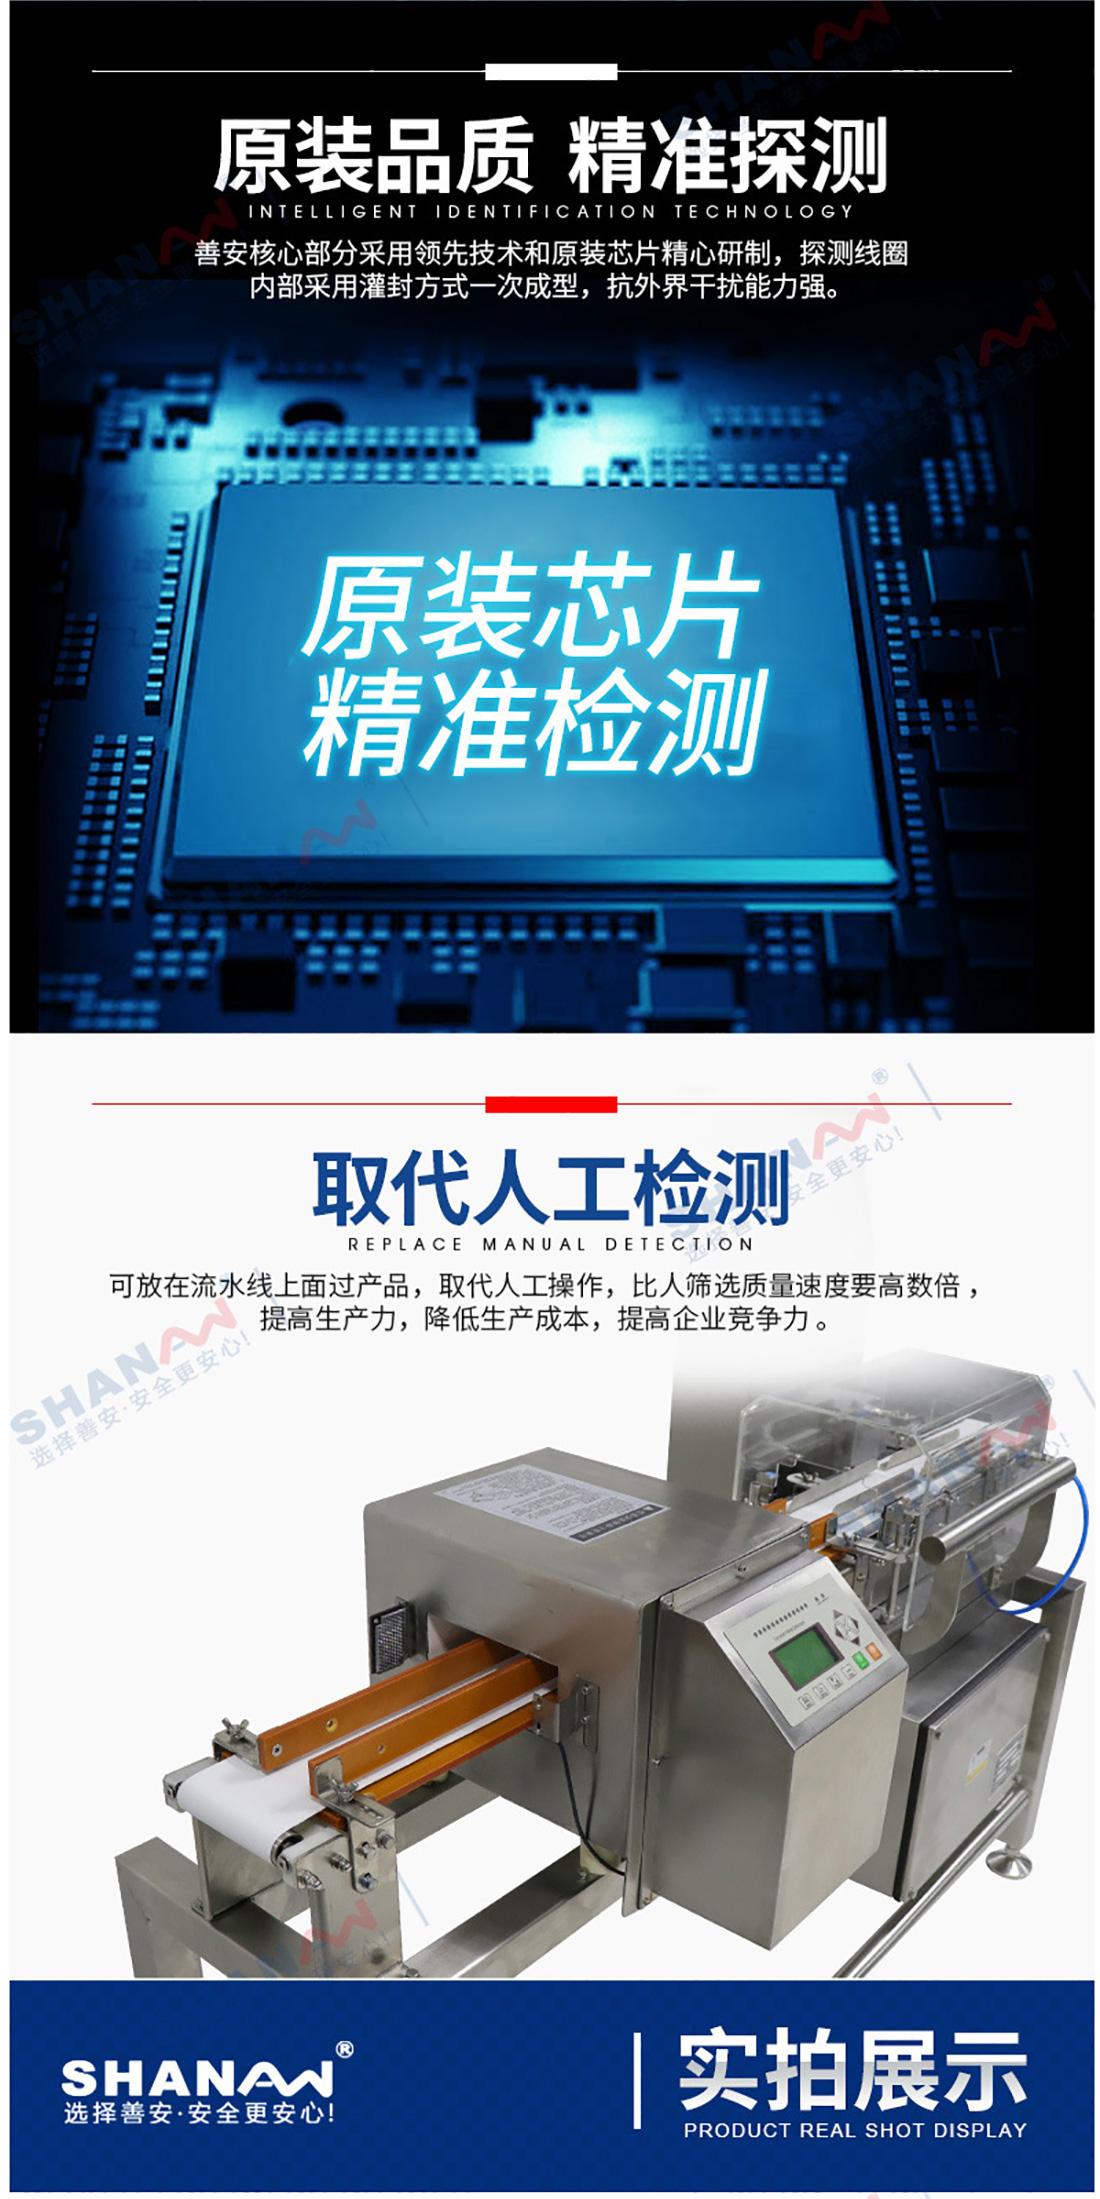 SAMDCW-120Agaojing度金检称zhong一体ji_05.jpg